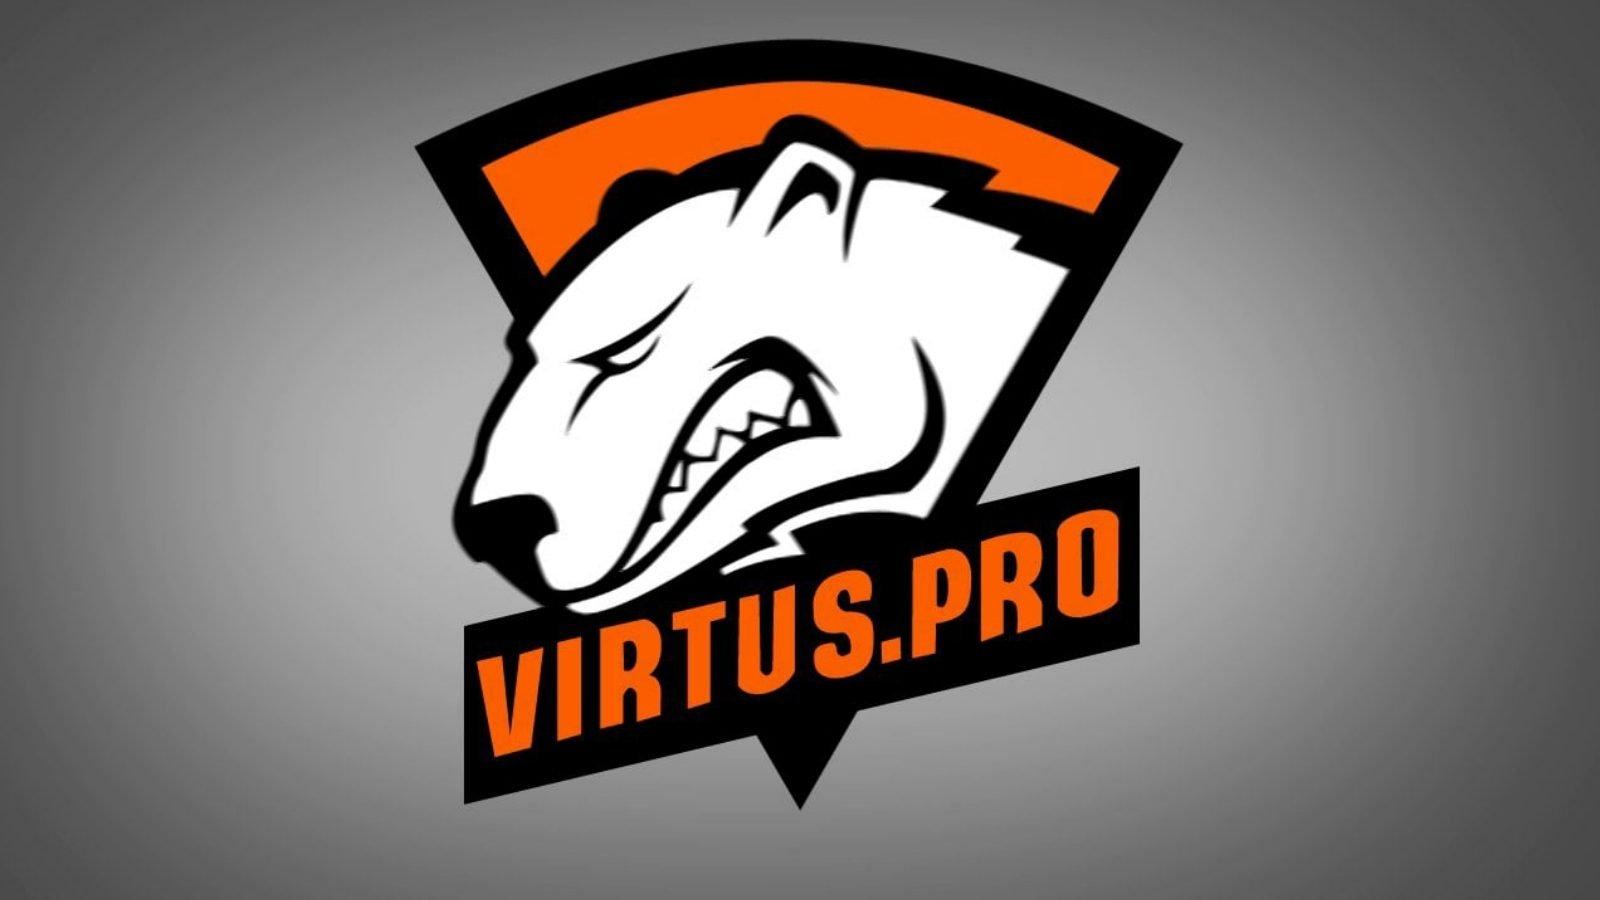 virtus pro 3